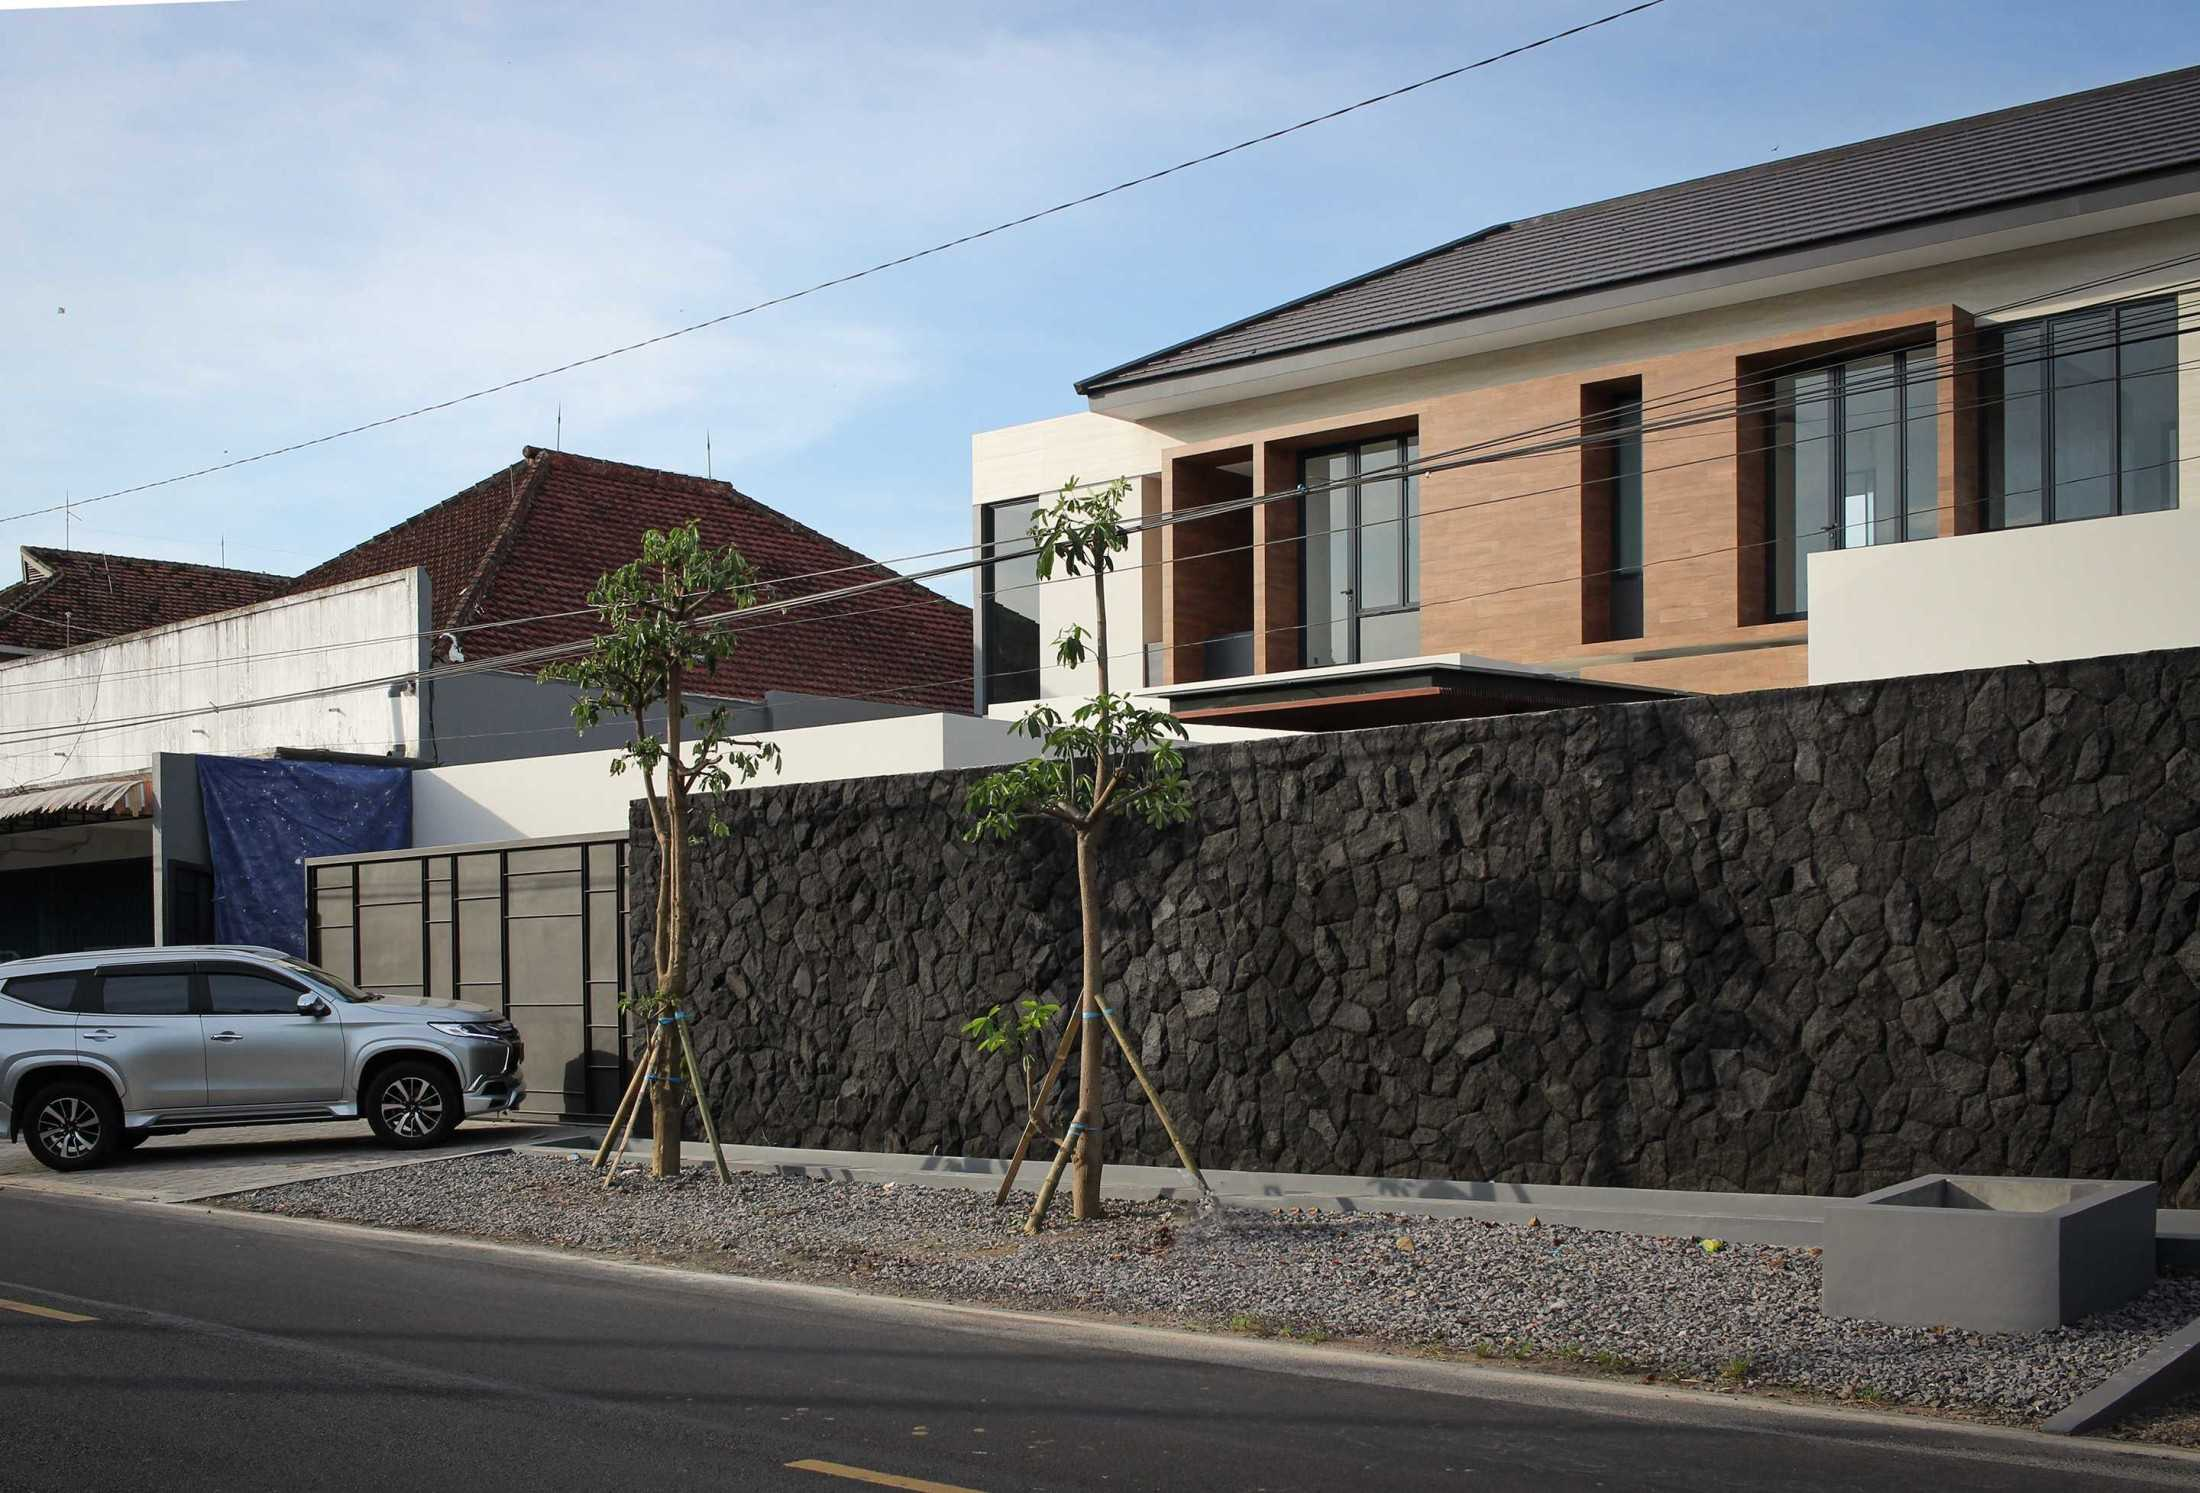 Y0 Design Architect S House Kec. Srono, Kabupaten Banyuwangi, Jawa Timur, Indonesia Kec. Srono, Kabupaten Banyuwangi, Jawa Timur, Indonesia Yohanes-Iswara-Limandjaya-S-House  121072